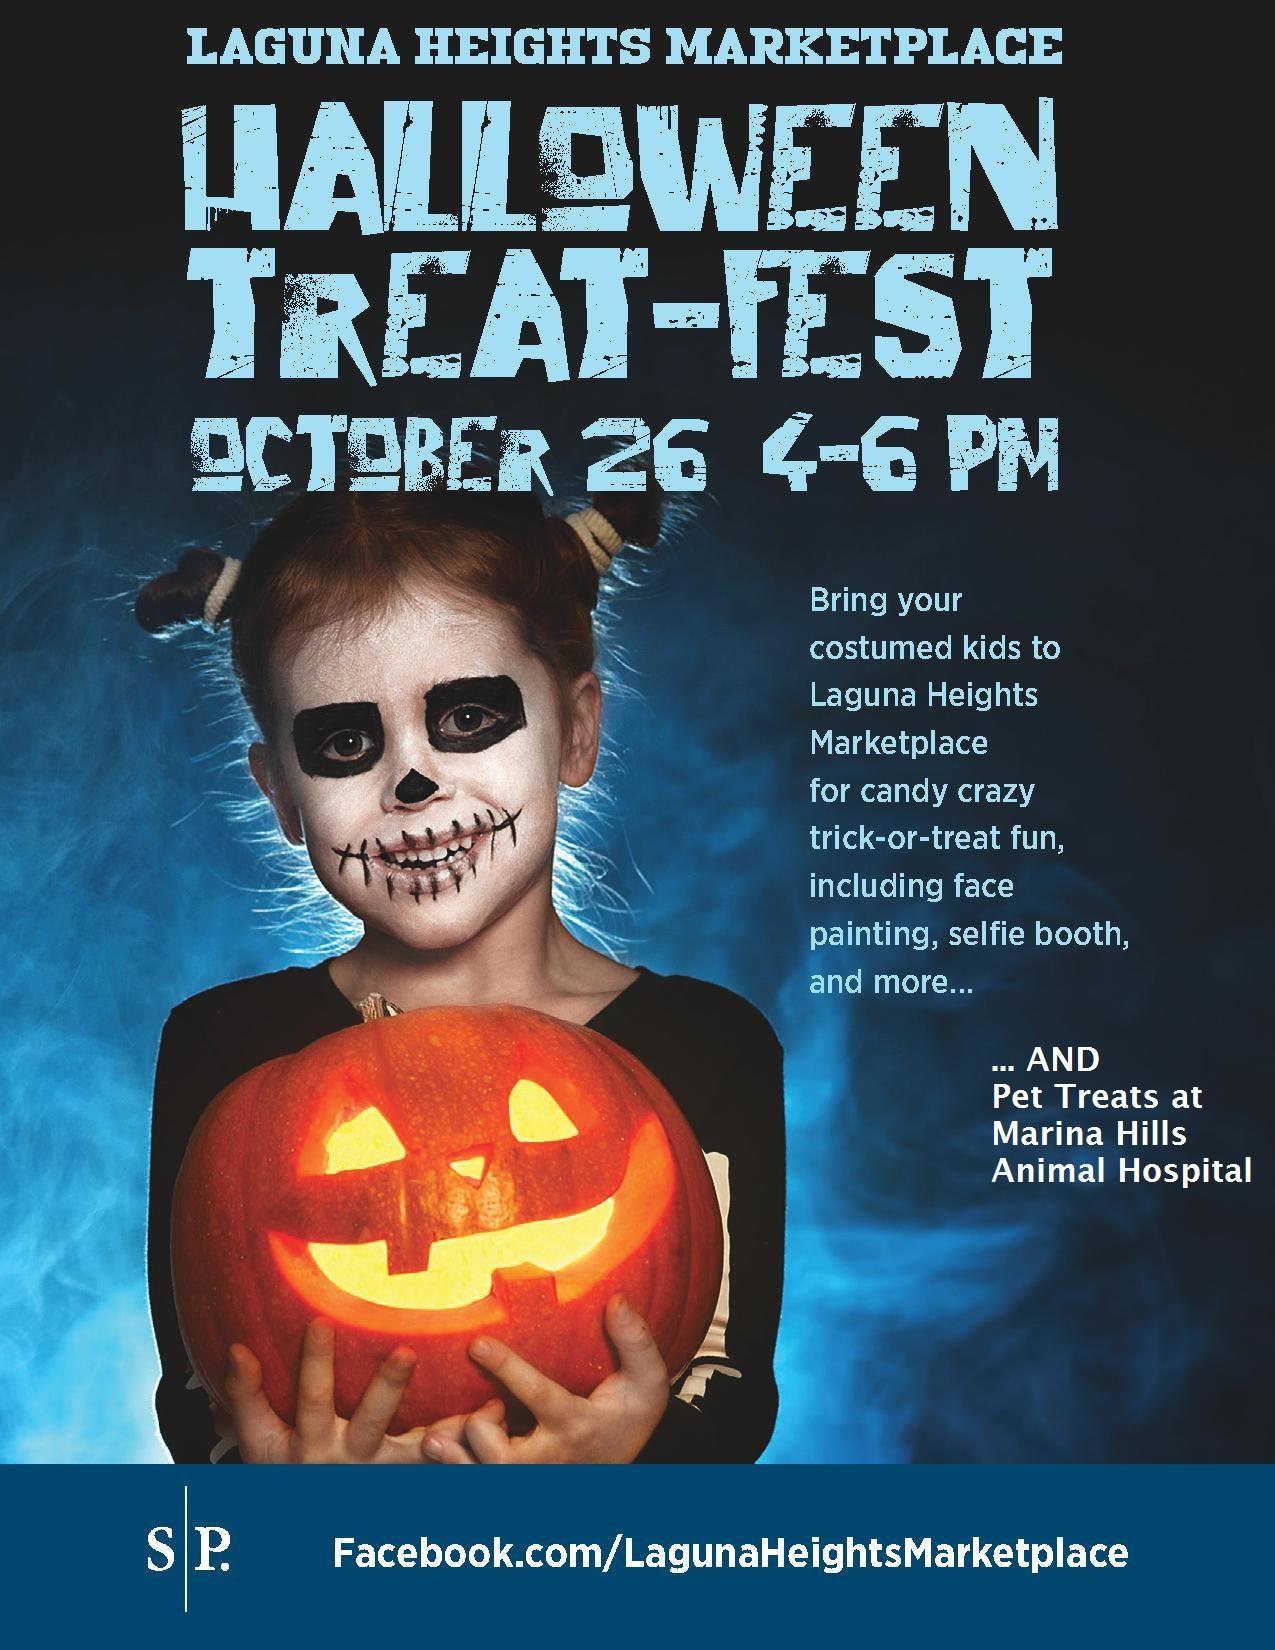 Halloween Treat Fest